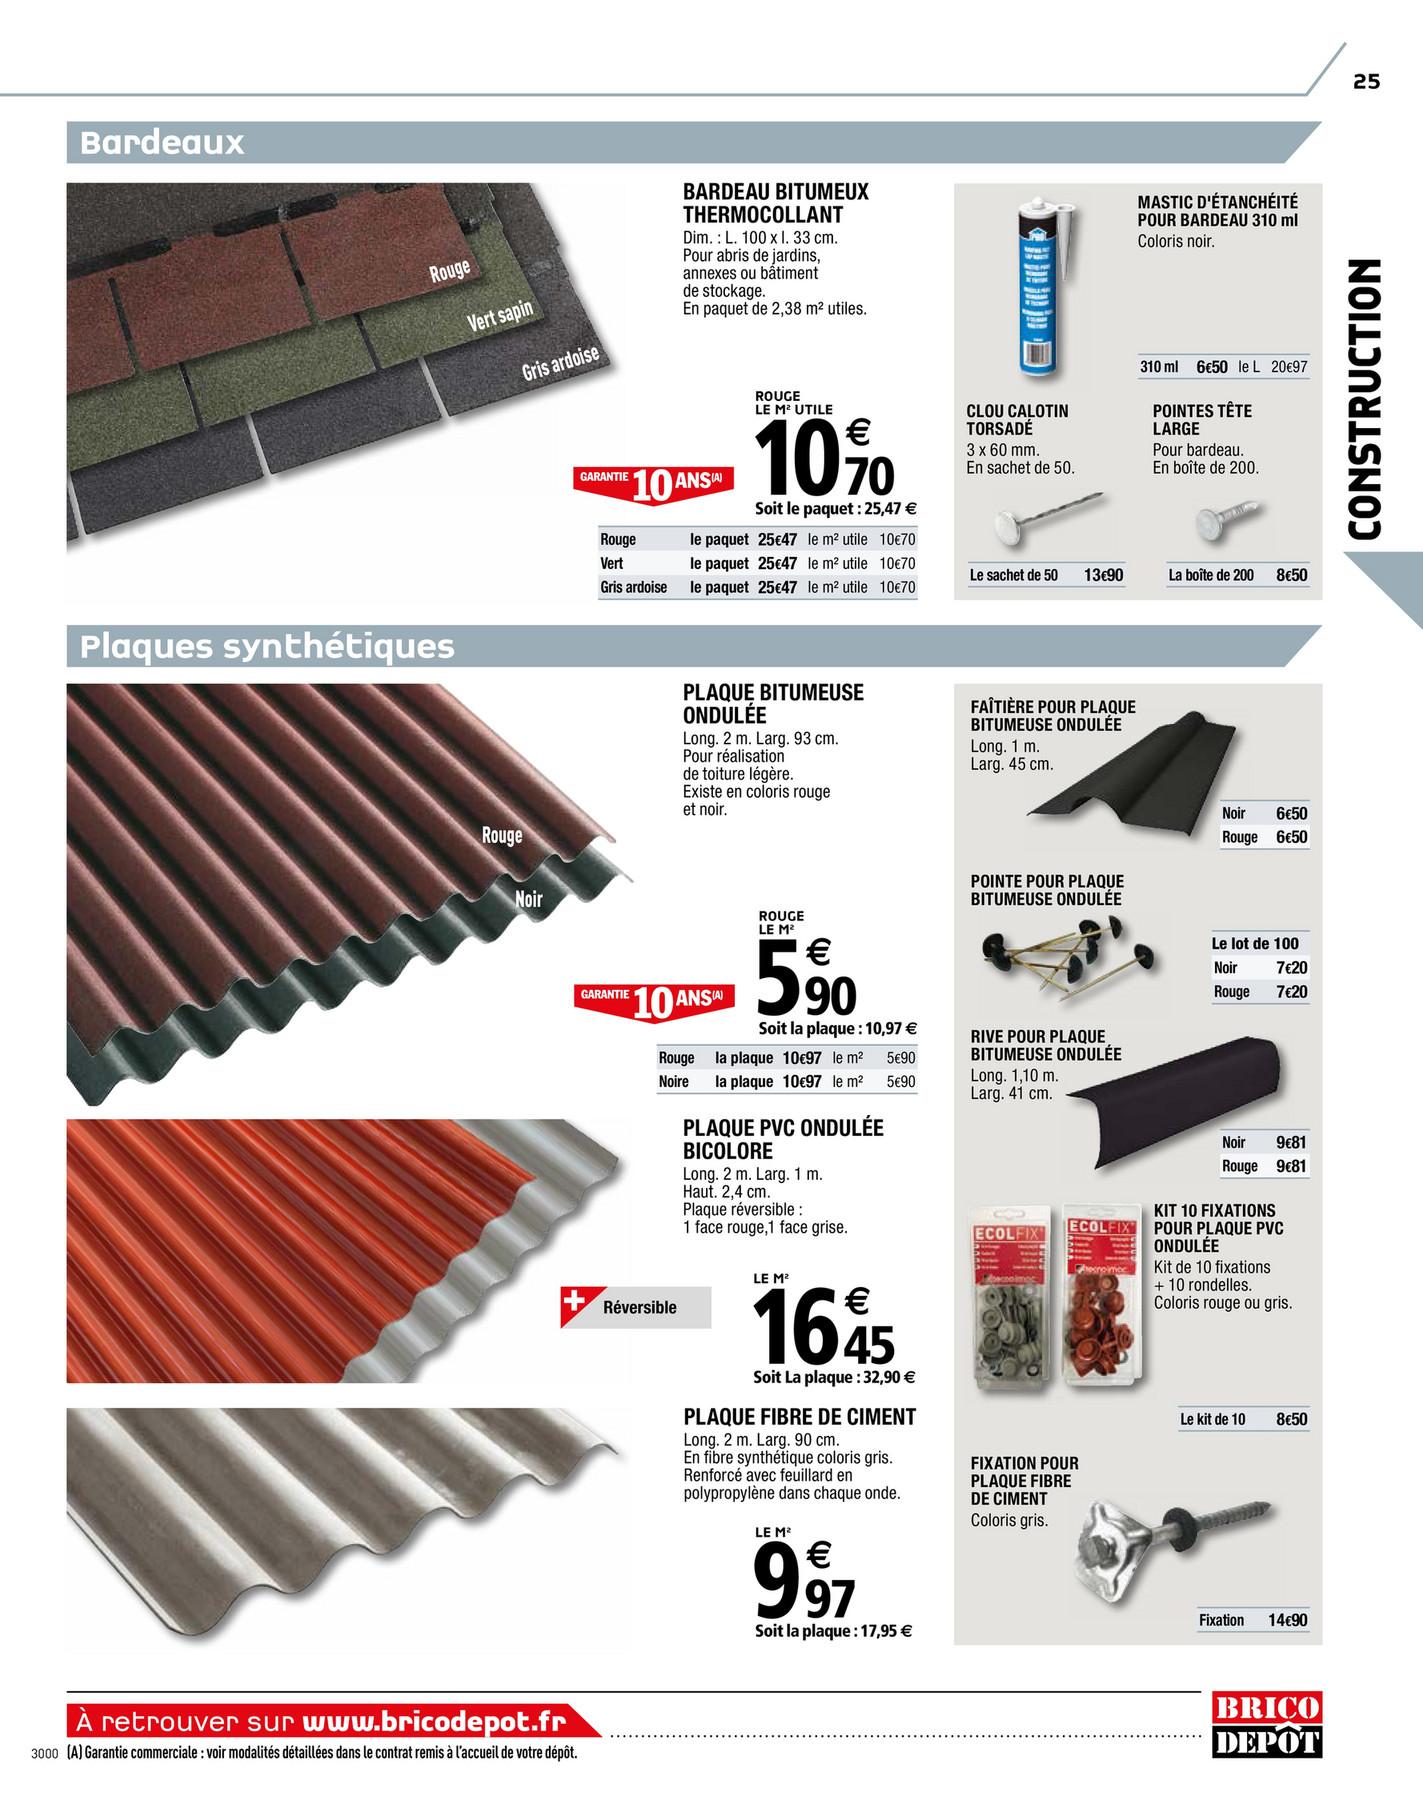 Folderaanbiedingen Catalogue Brico Depot Pagina 26 27